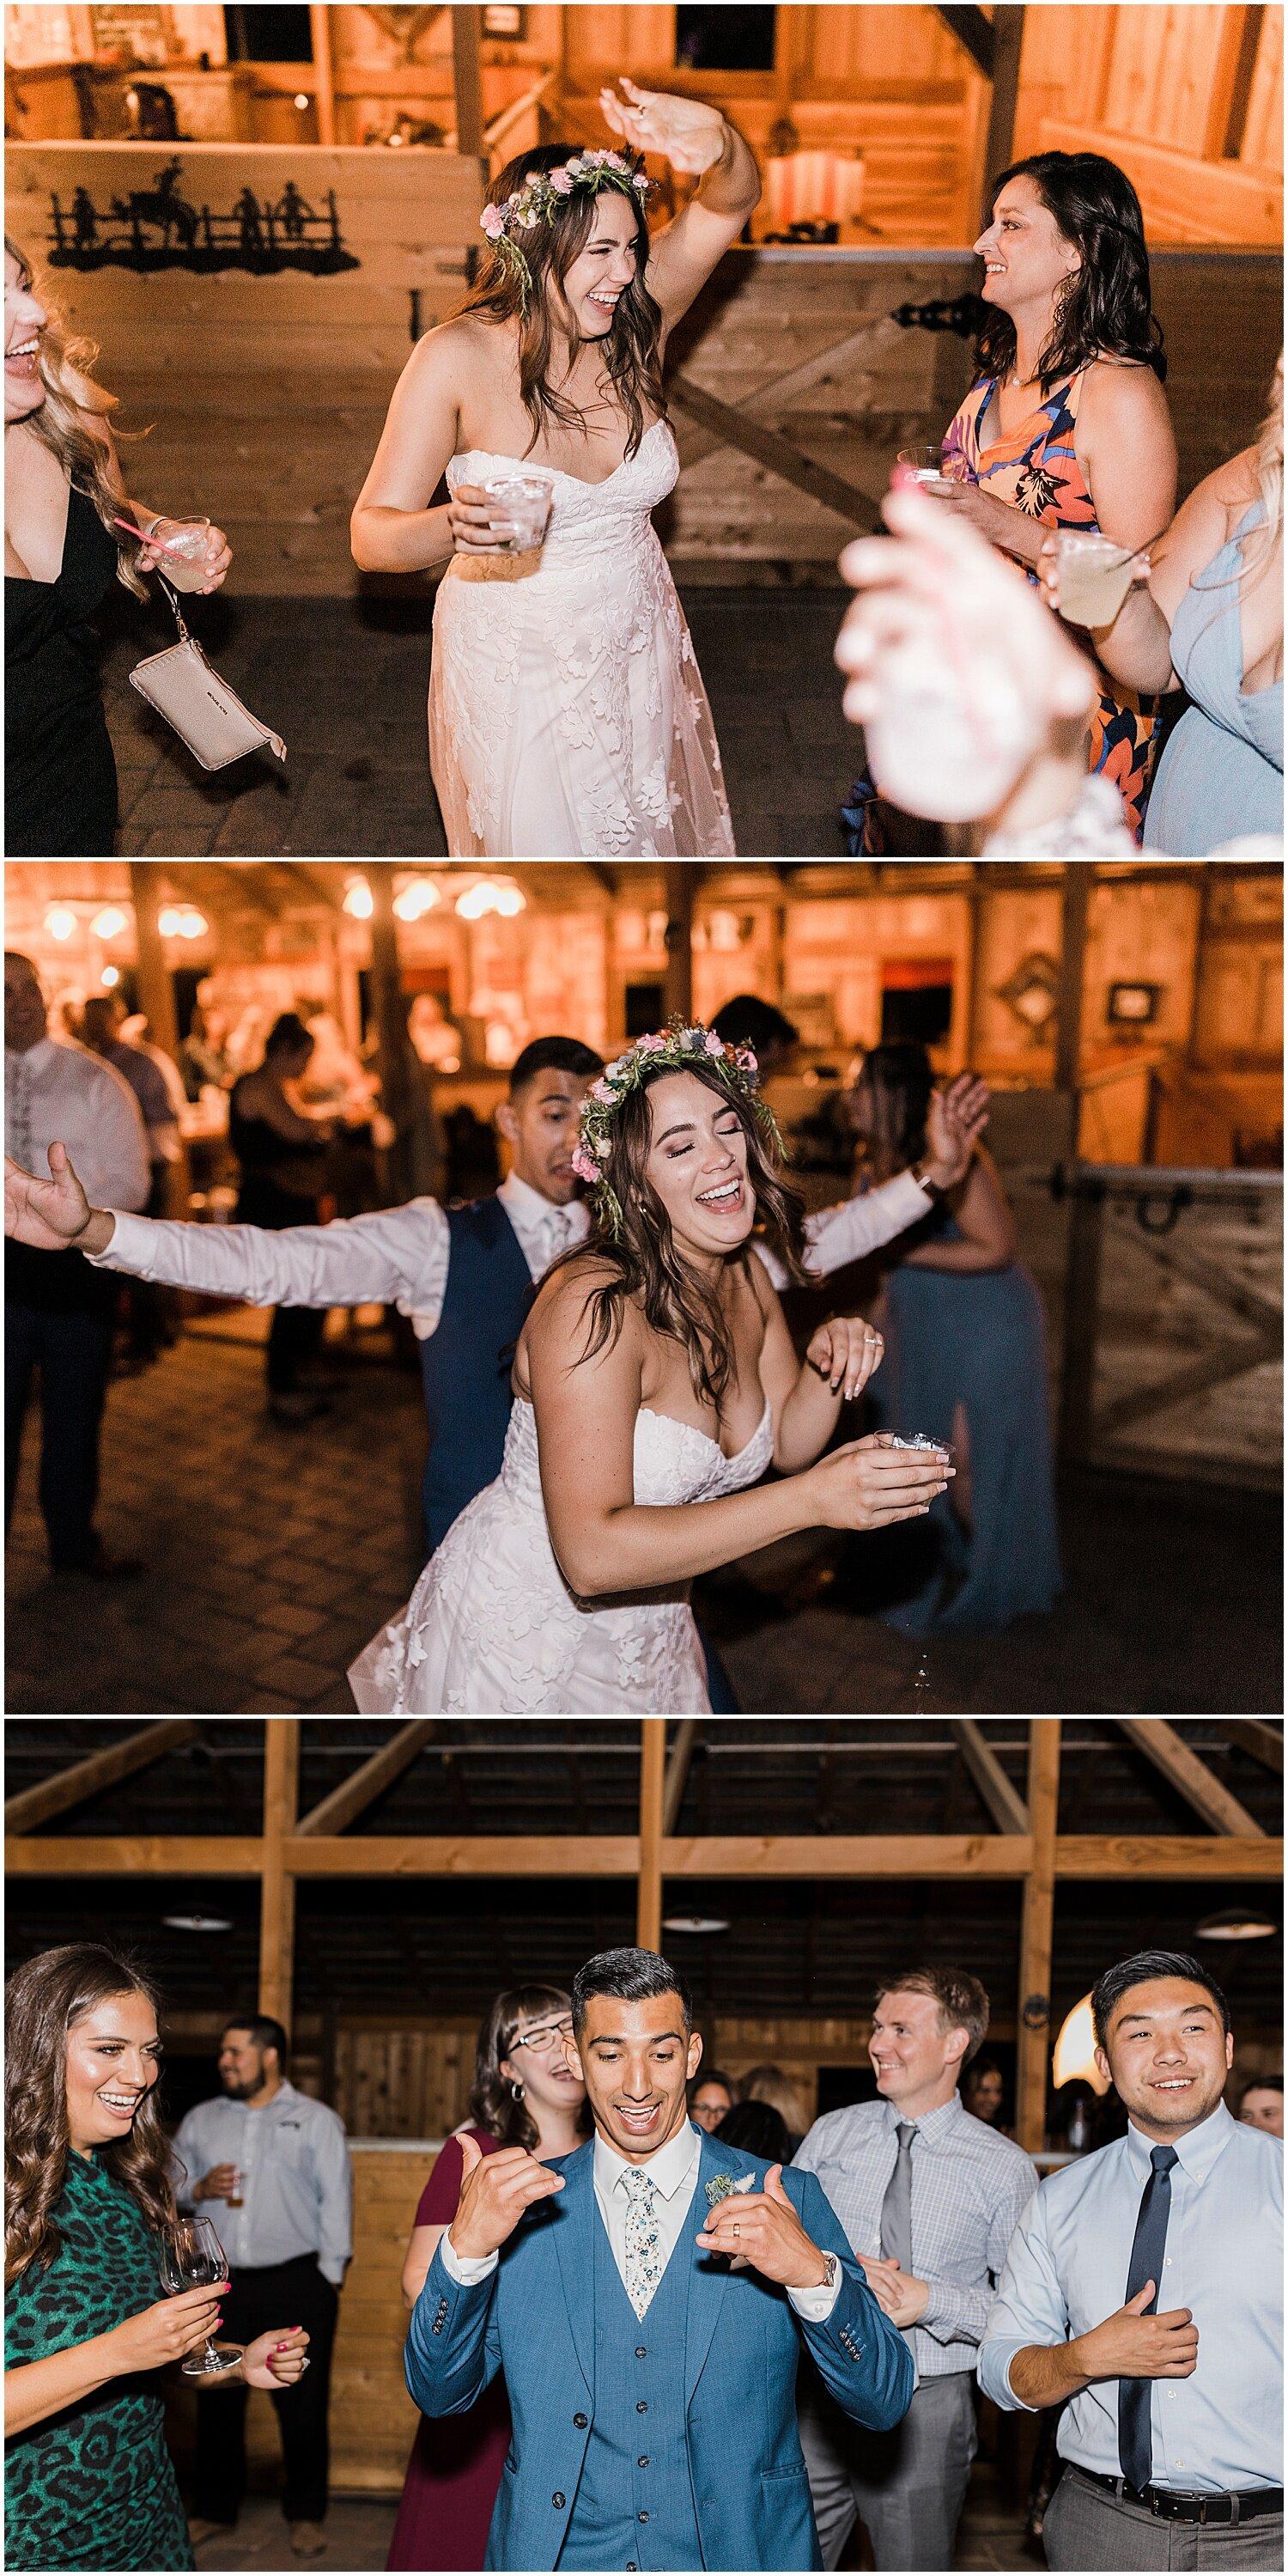 bayareawedding_martinezwedding_sacramentowedding_photographer_jblhomeranch_NICOLEQUIROZ_30.jpg